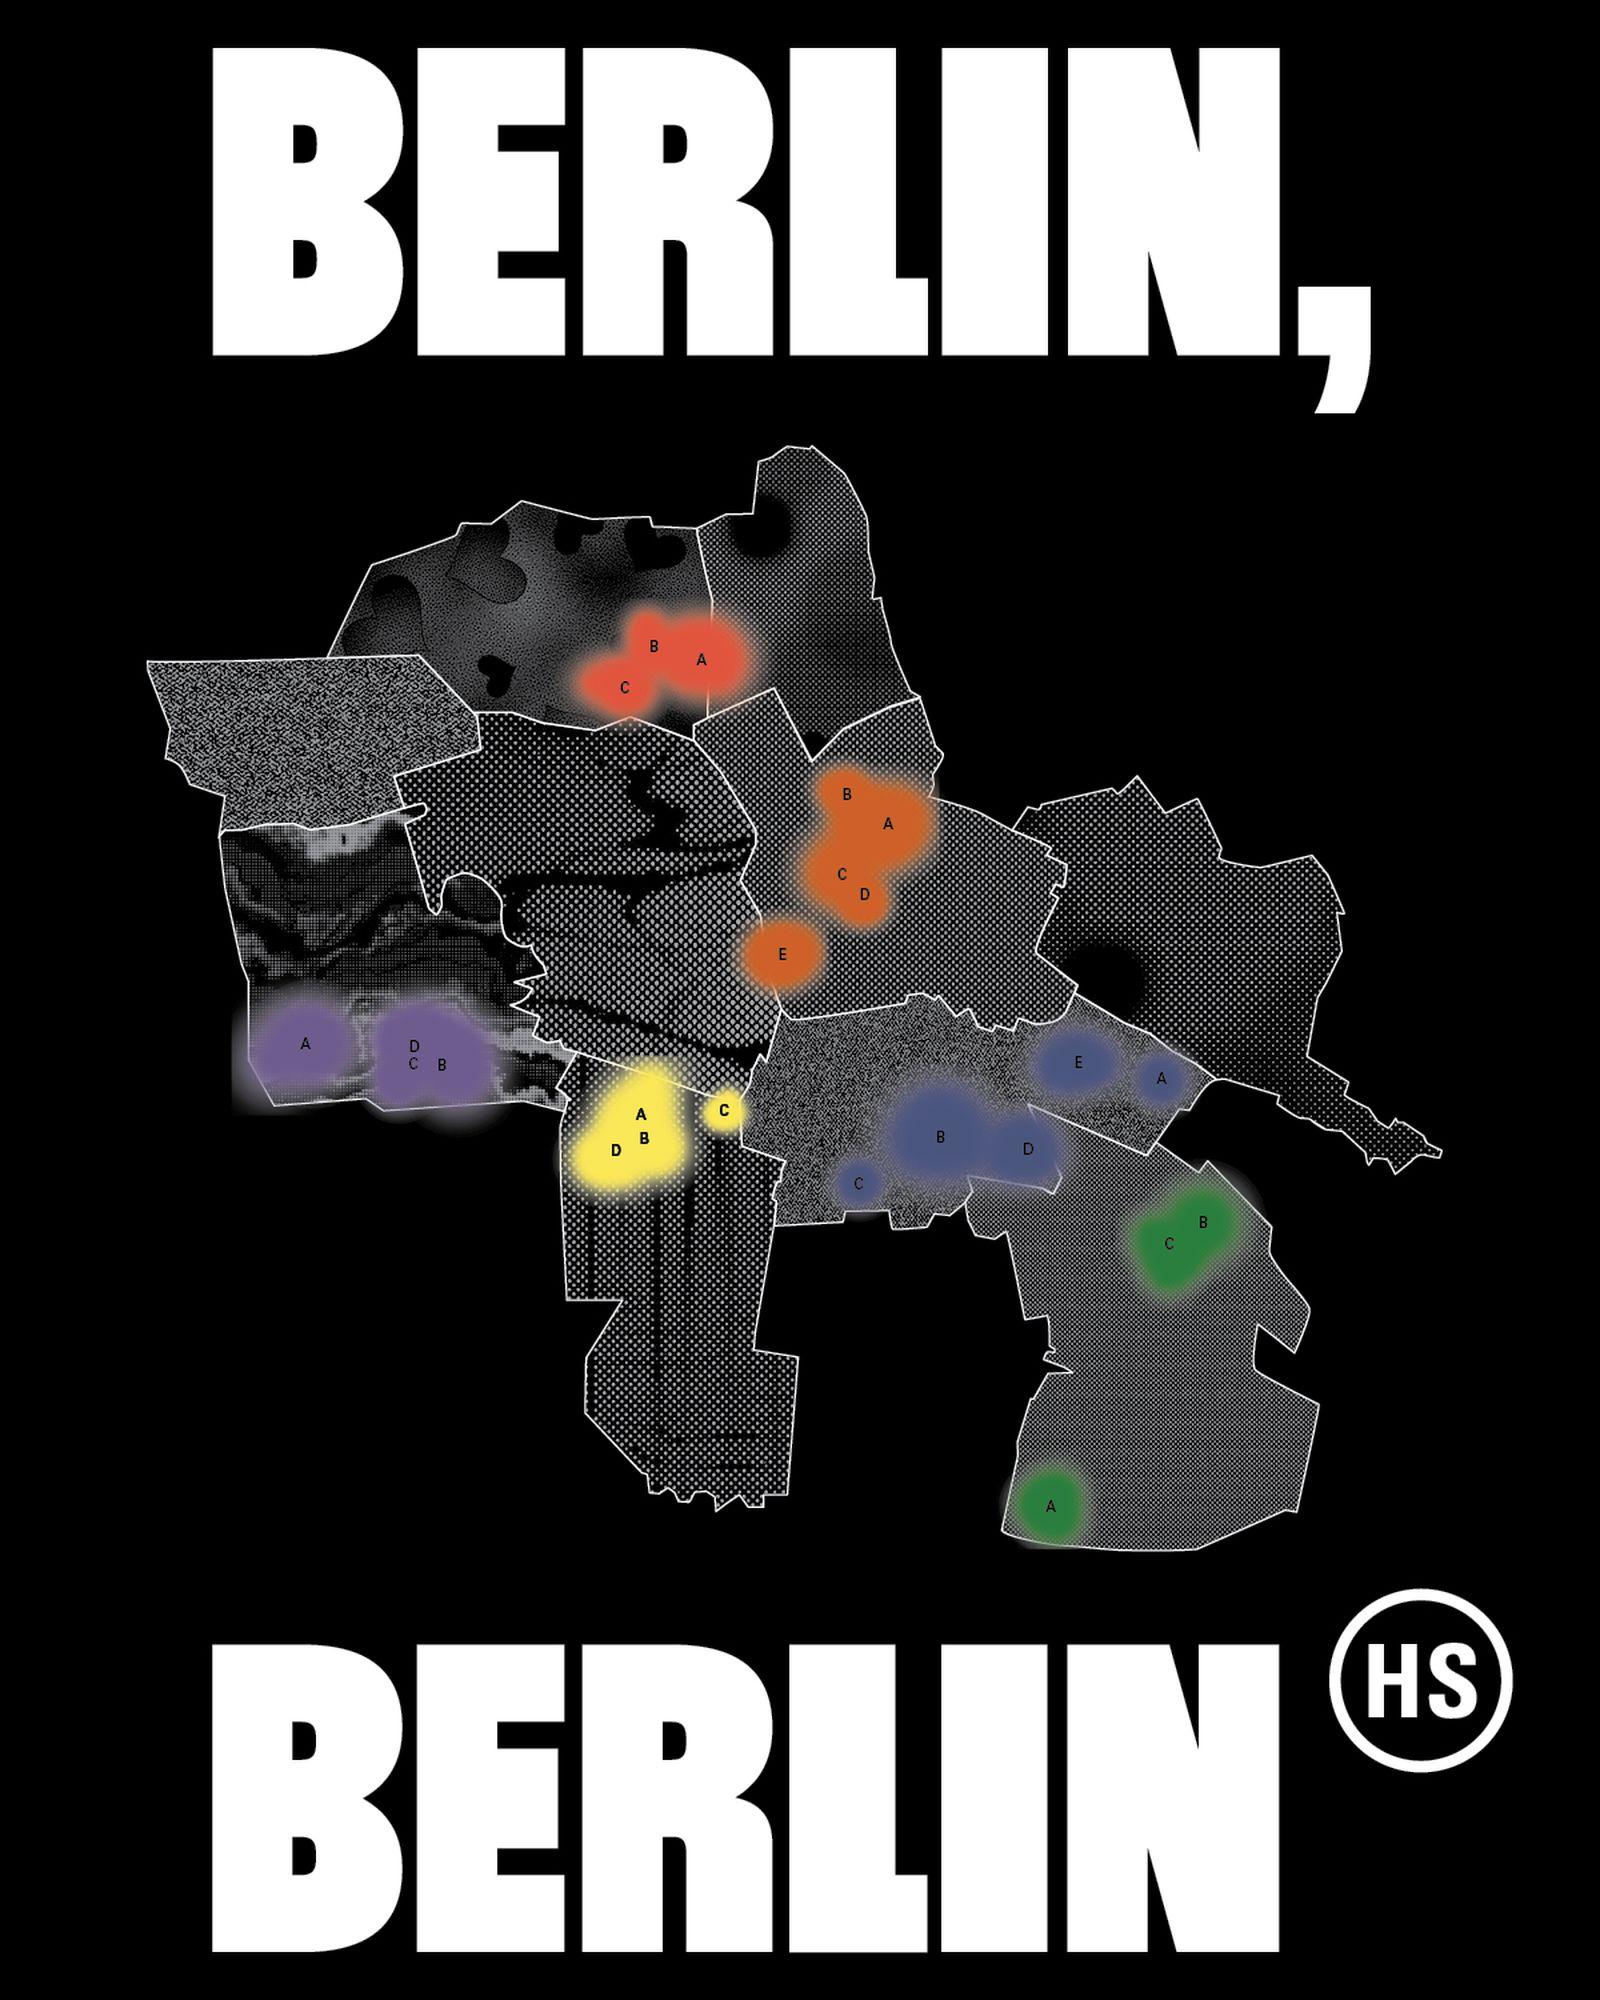 200122_BR_Events_Berlin_Berlin_CitiGuide_Web_Main_option02